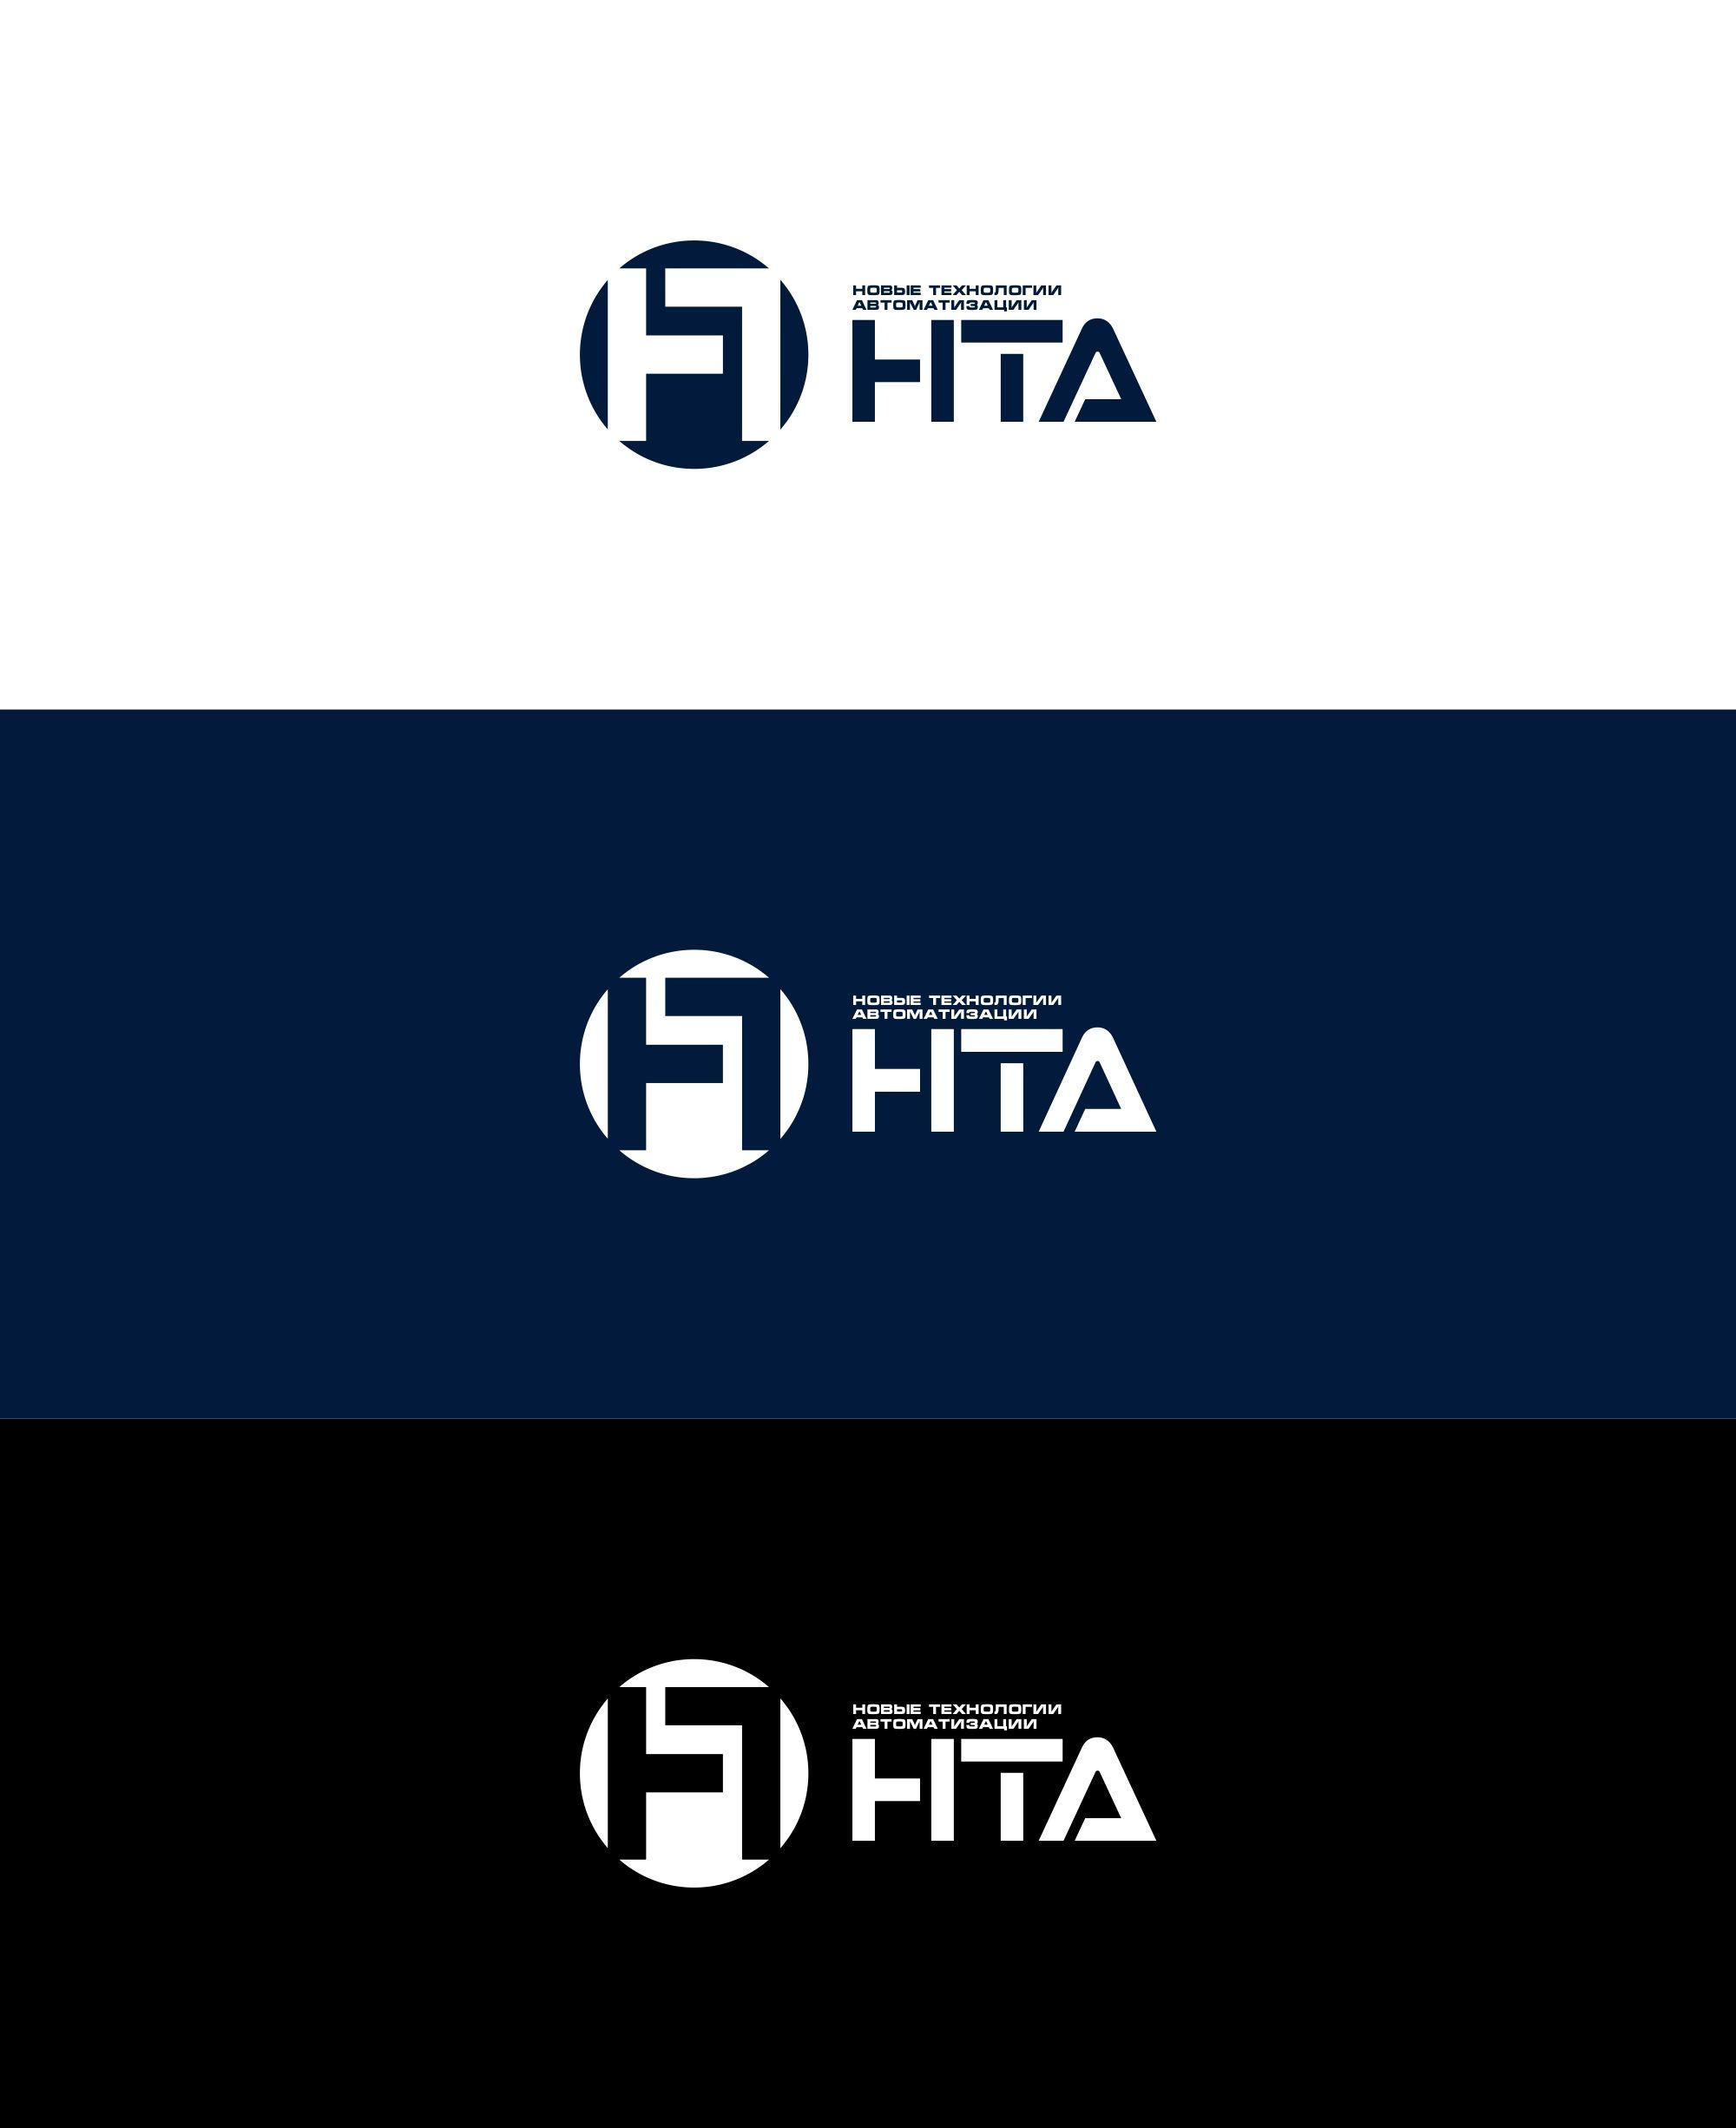 Логотип для НТА - дизайнер markosov